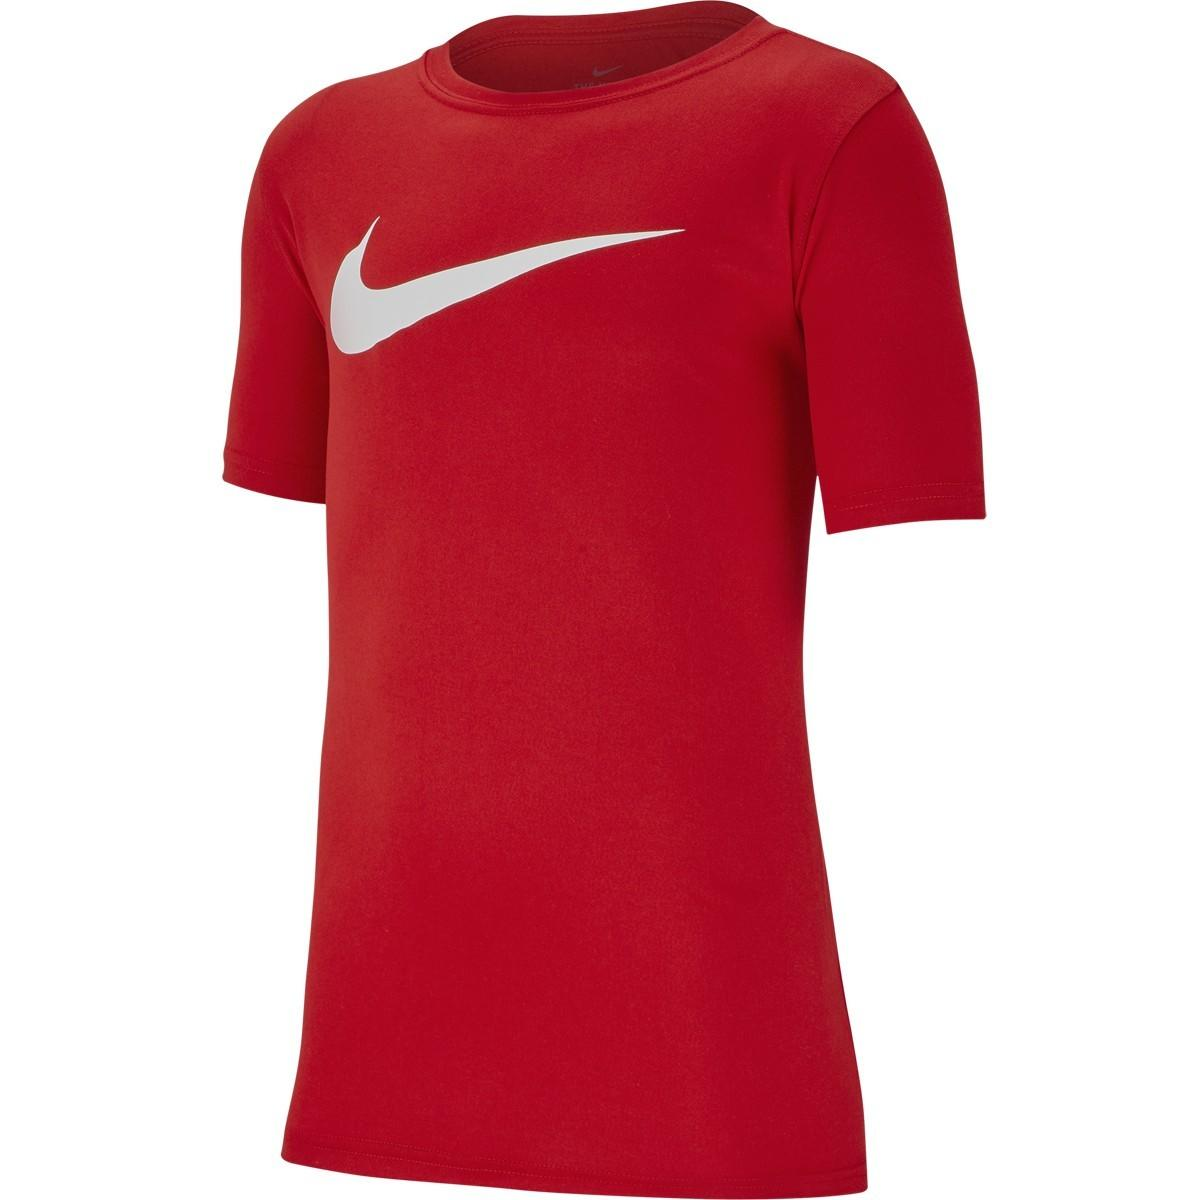 Теннисная футболка детская Nike Boy's Spring Dry Legend Swoosh Crew red